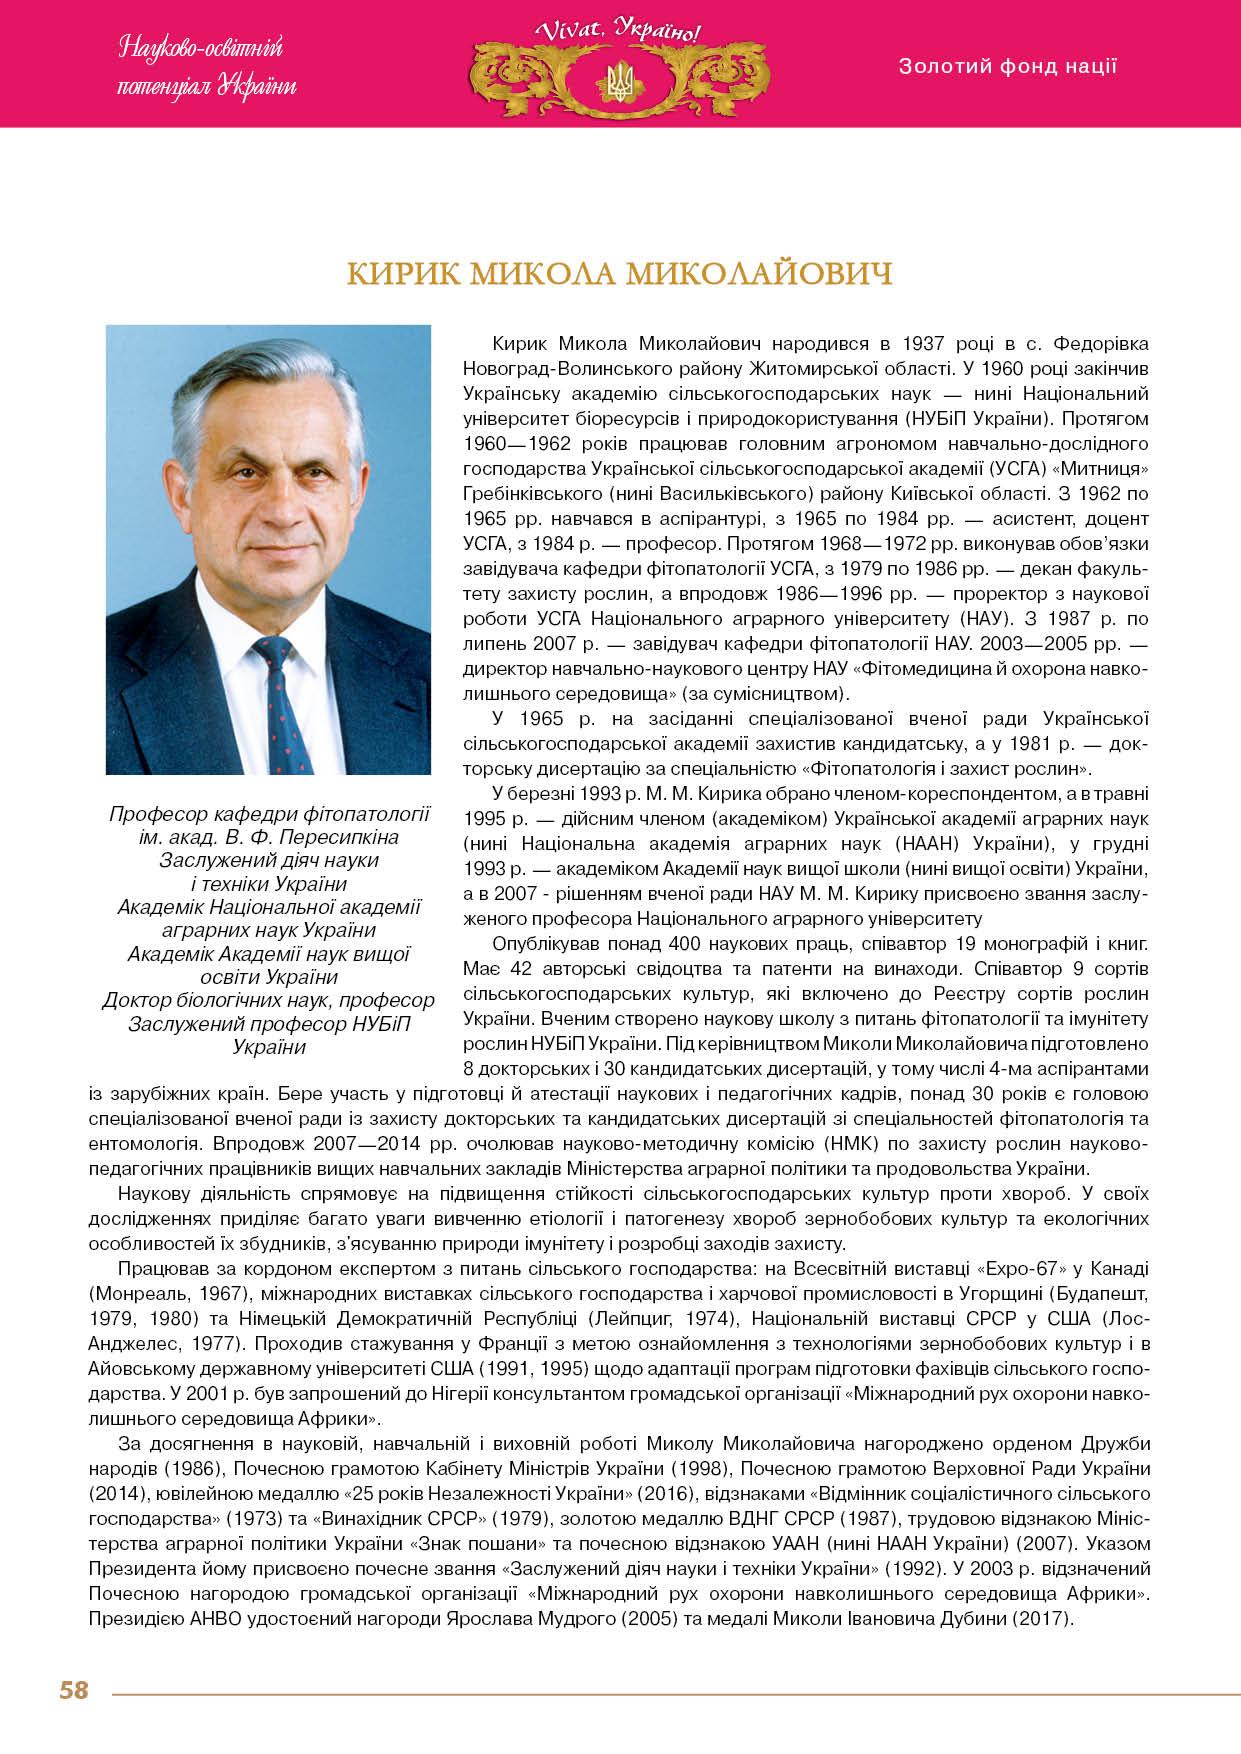 Кирик Микола Миколайович